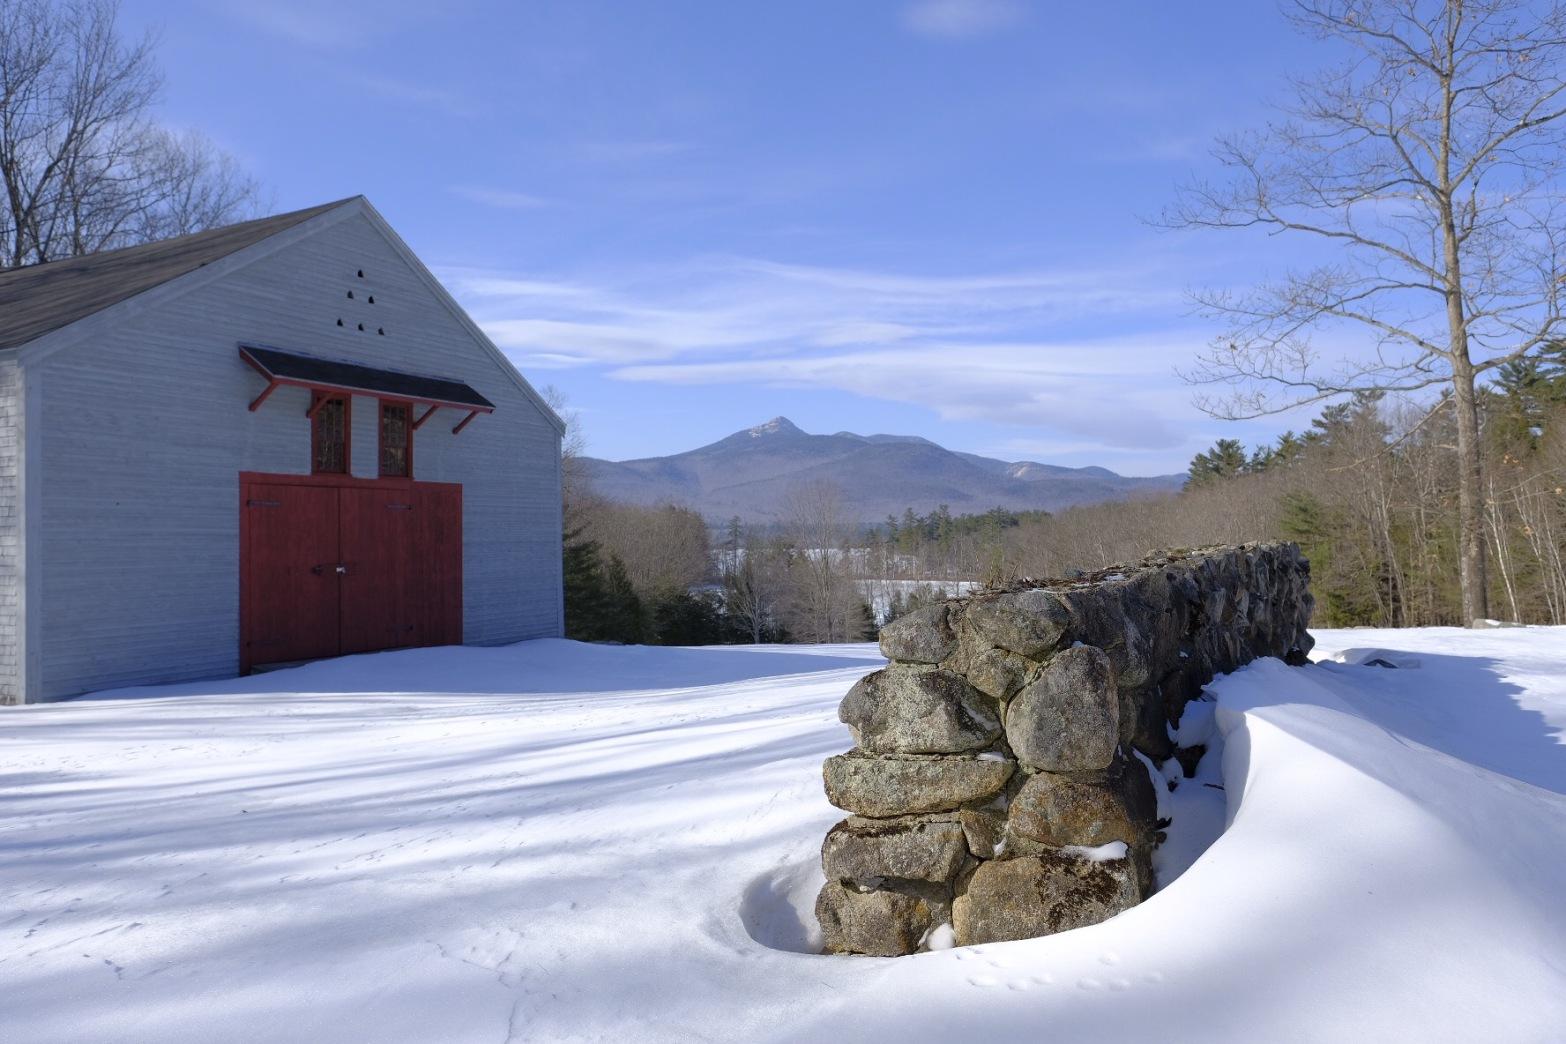 Gray barn with red door, overlooking mount Chocorua, New Hampshire winter scenery